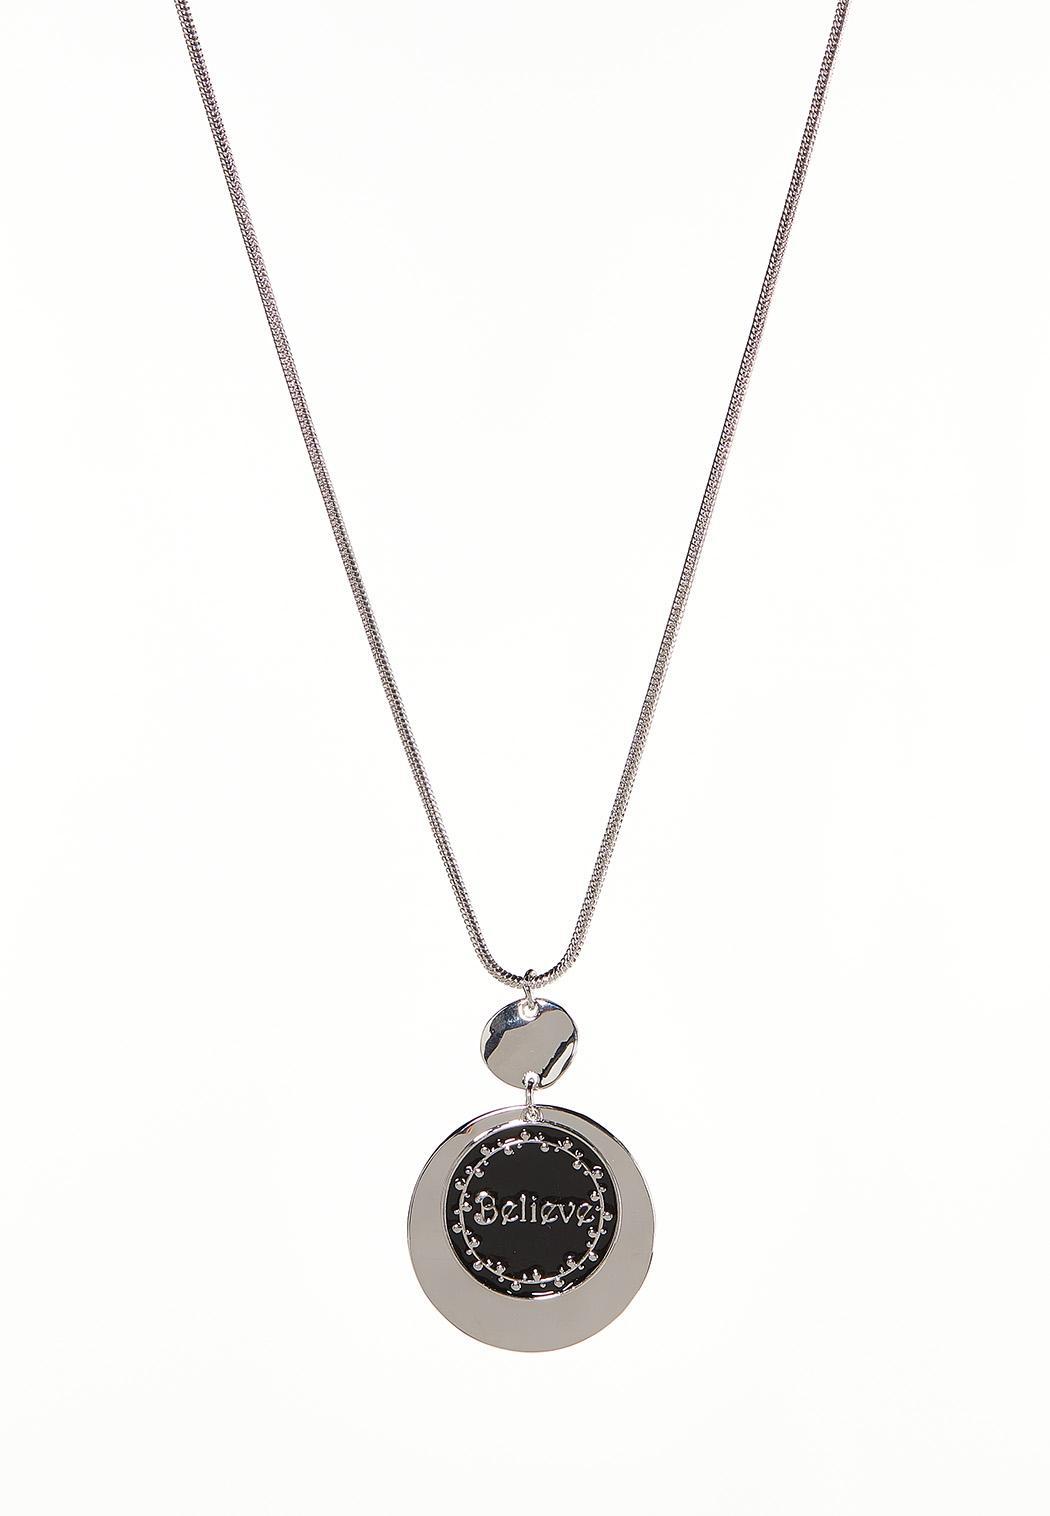 Believe Circle Pendant Necklace